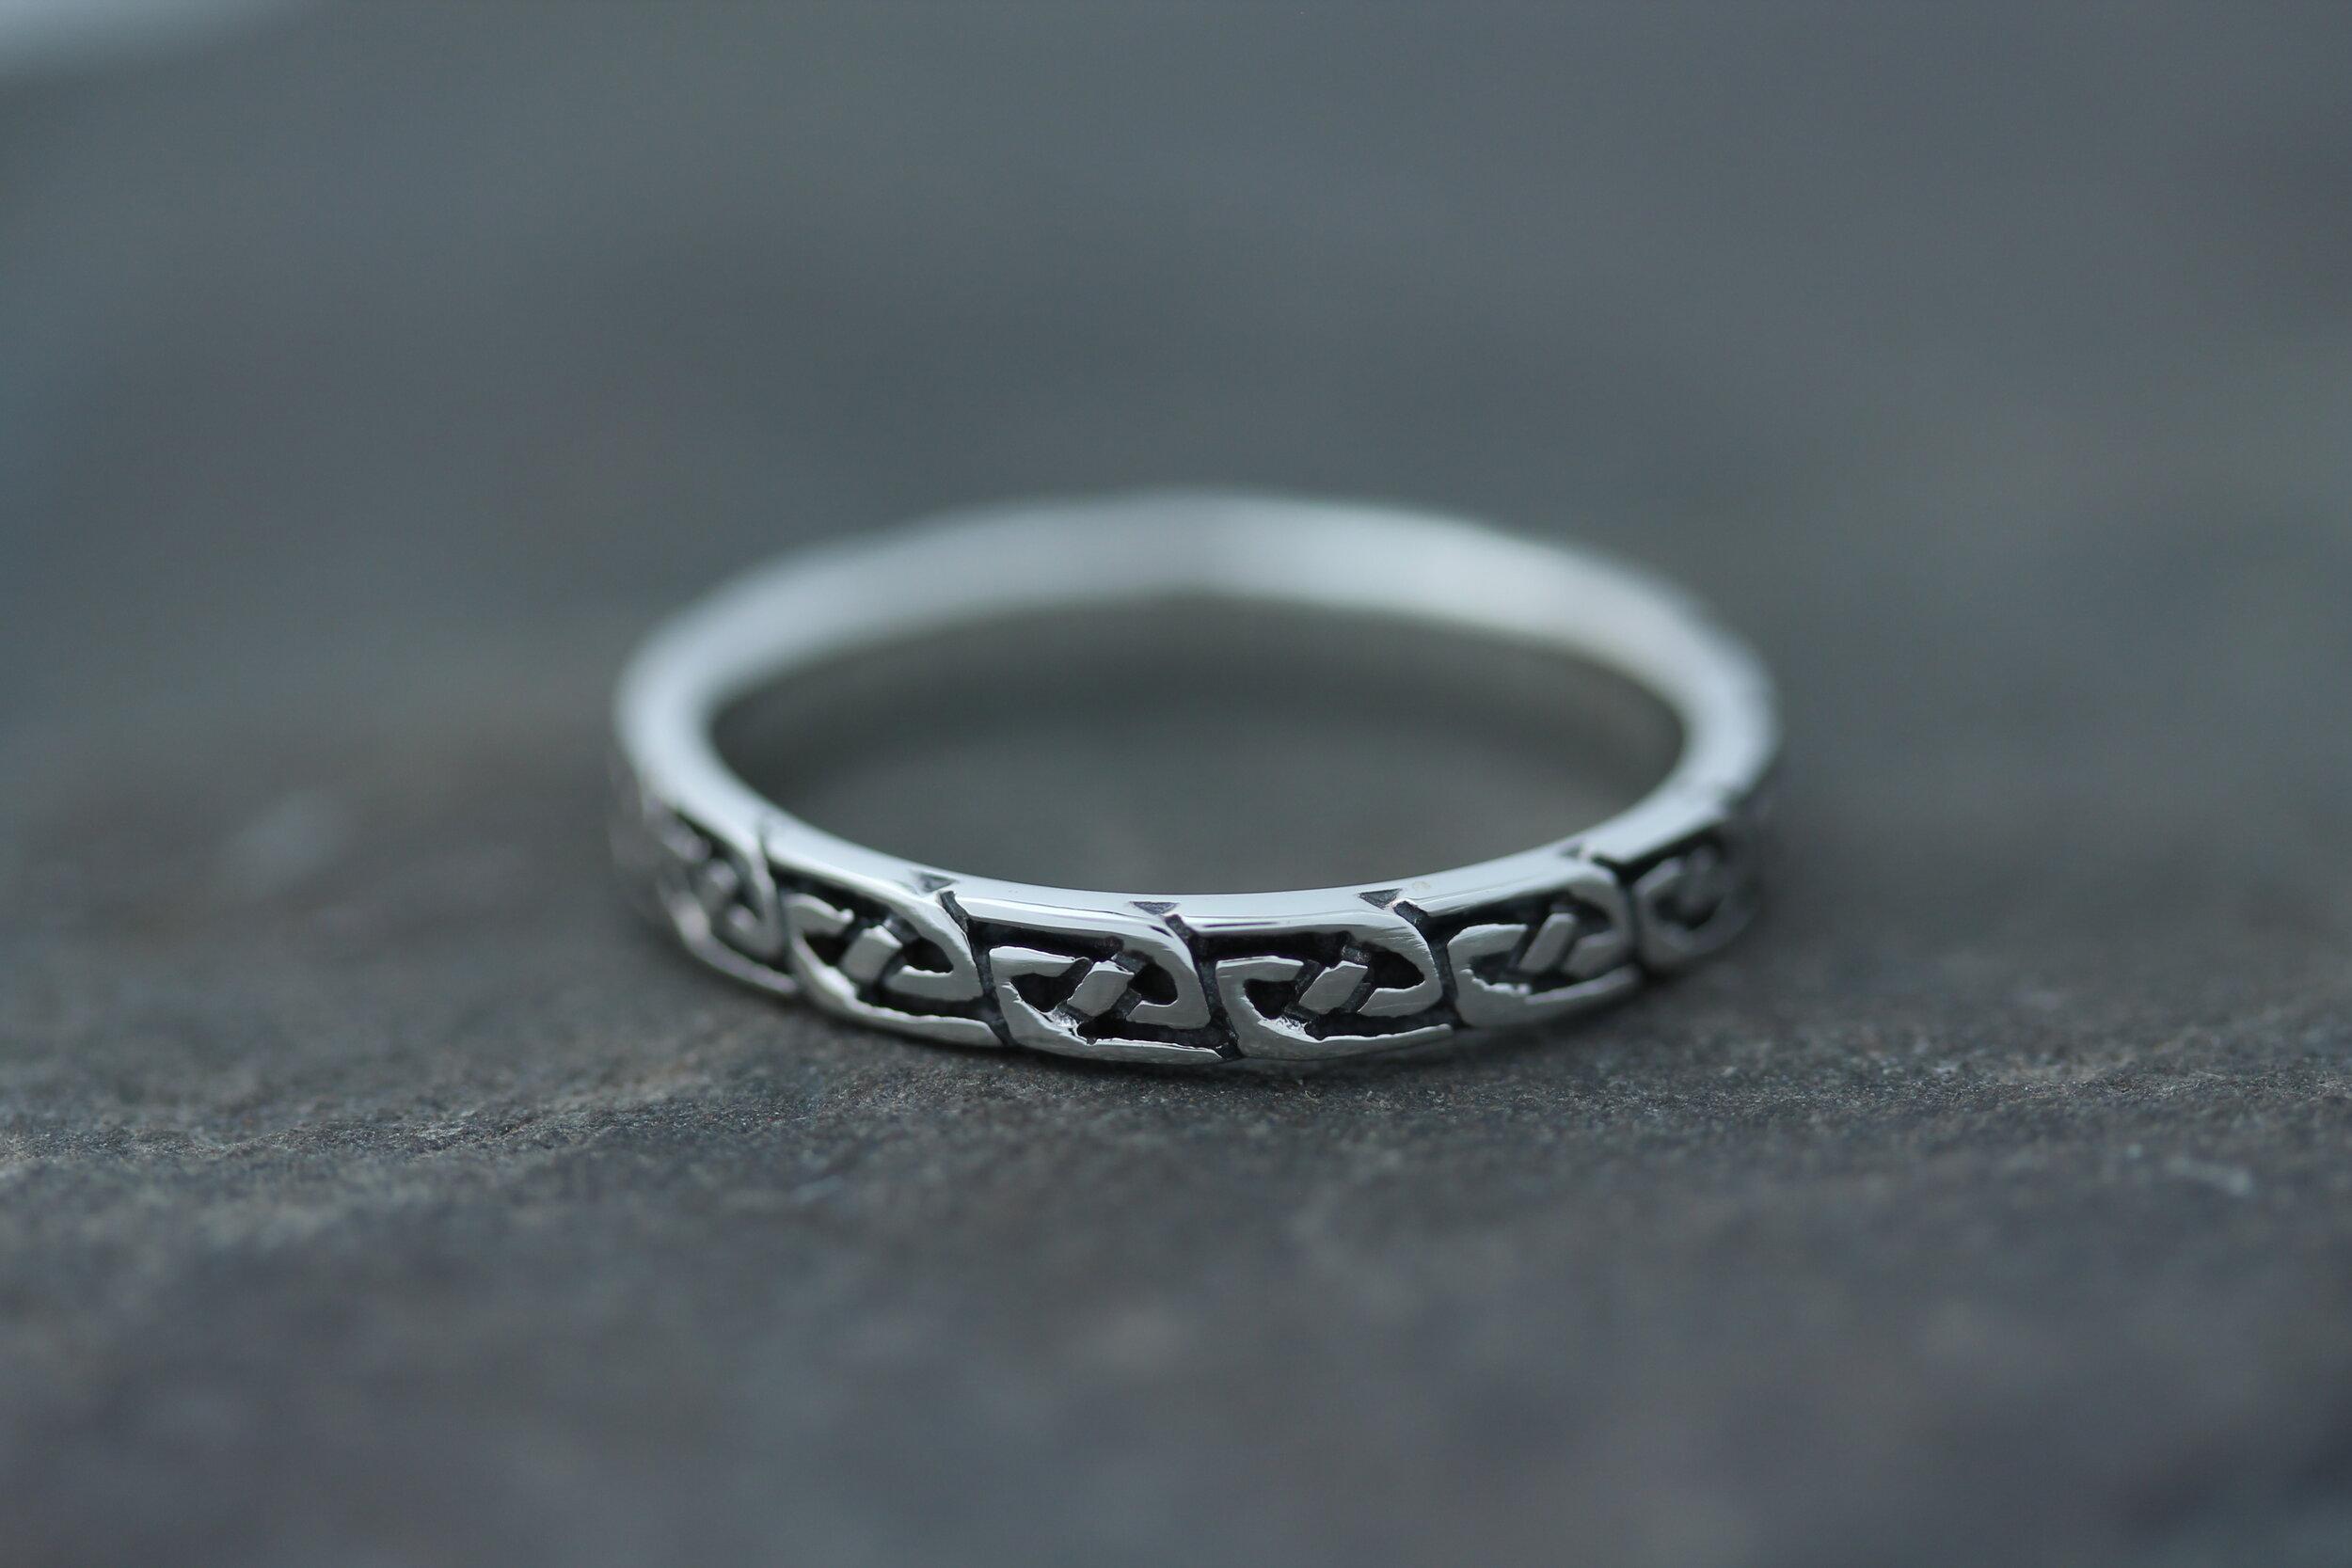 Celtic Knot Ring Thin Infinite Pictish Knot Celtic Design Scotland